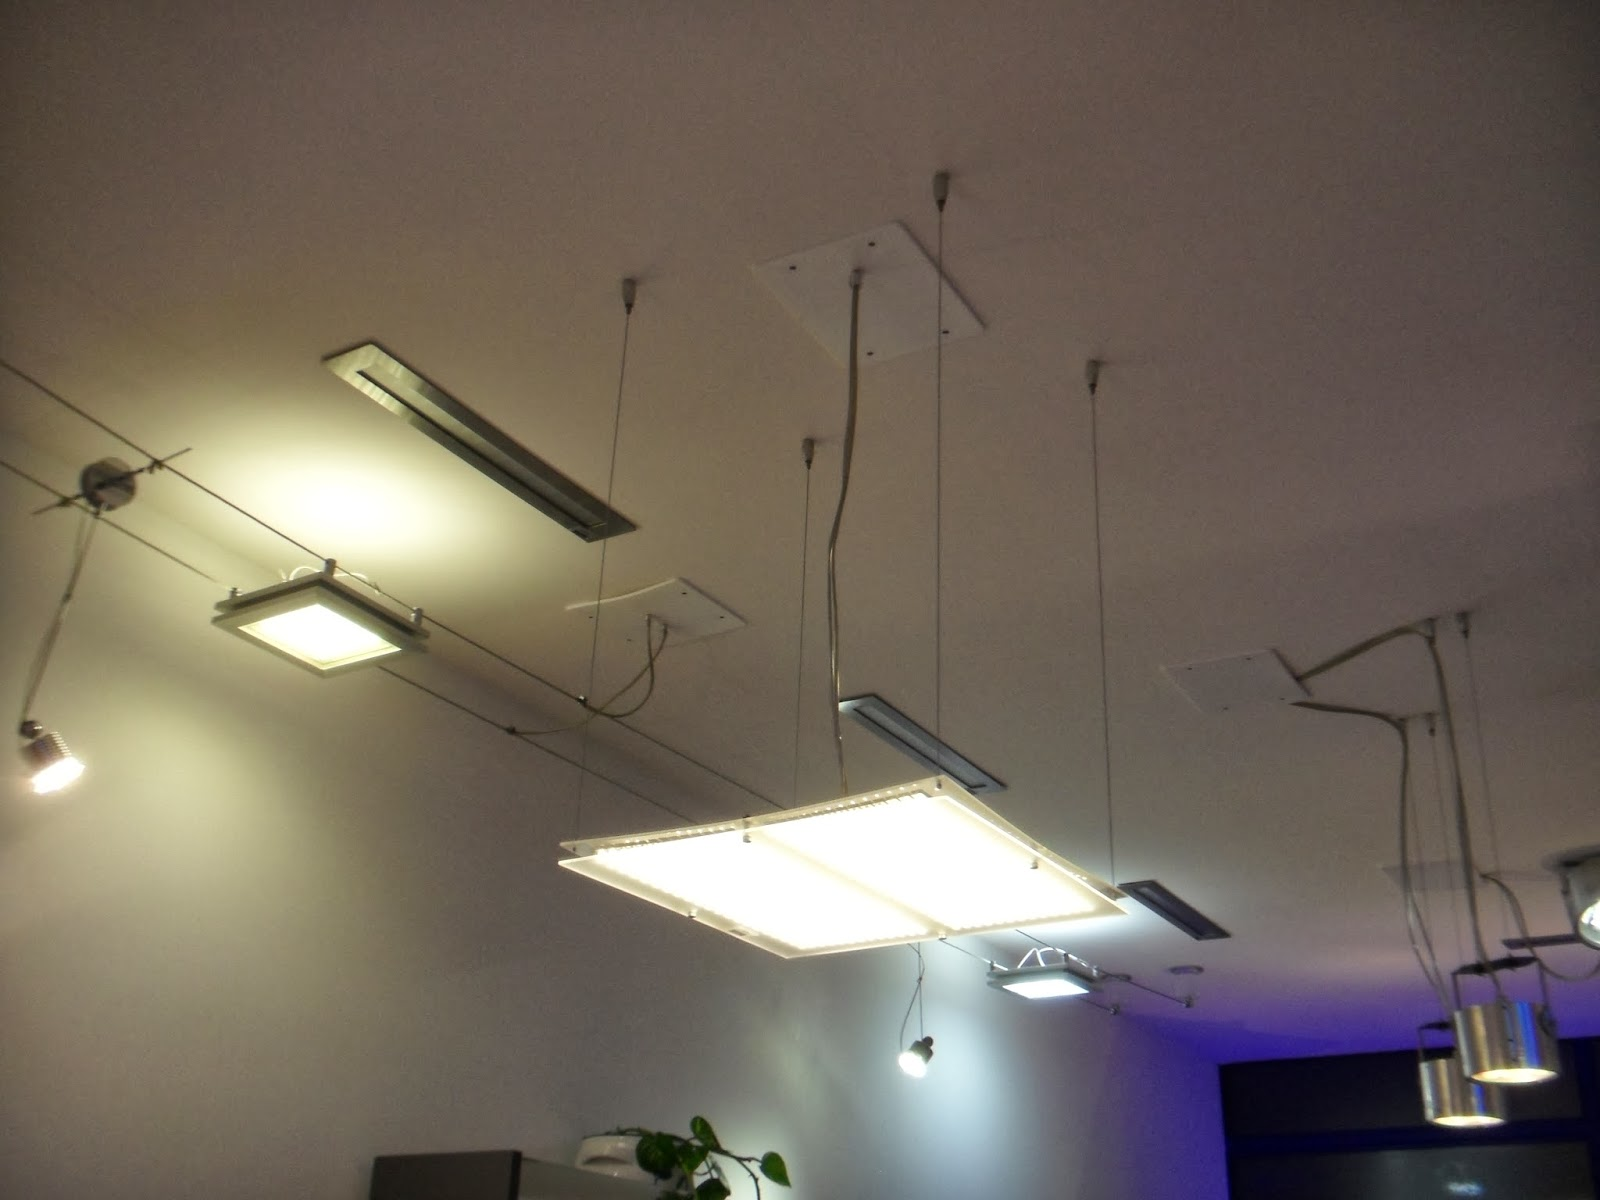 Luci per scale interne beide kanten bieden heerlijke warmte with luci per scale interne - Luci per scale ...